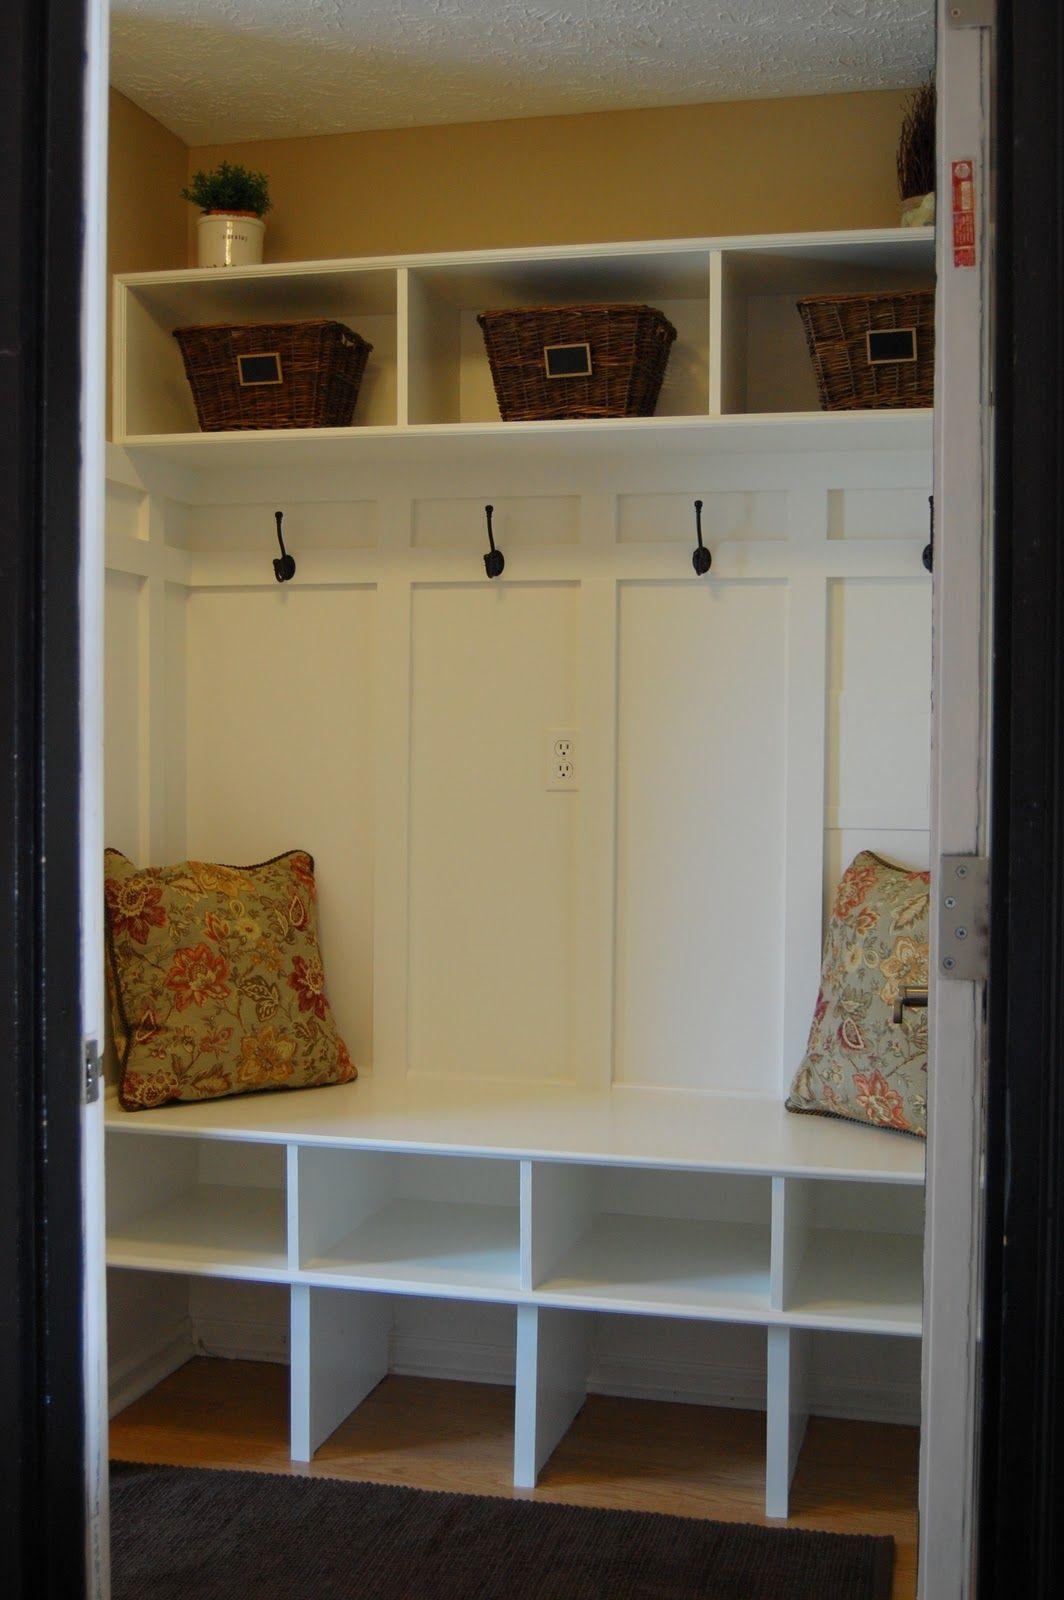 id e rangement pour entr e id e maison pinterest idee rangement entr e et rangement. Black Bedroom Furniture Sets. Home Design Ideas